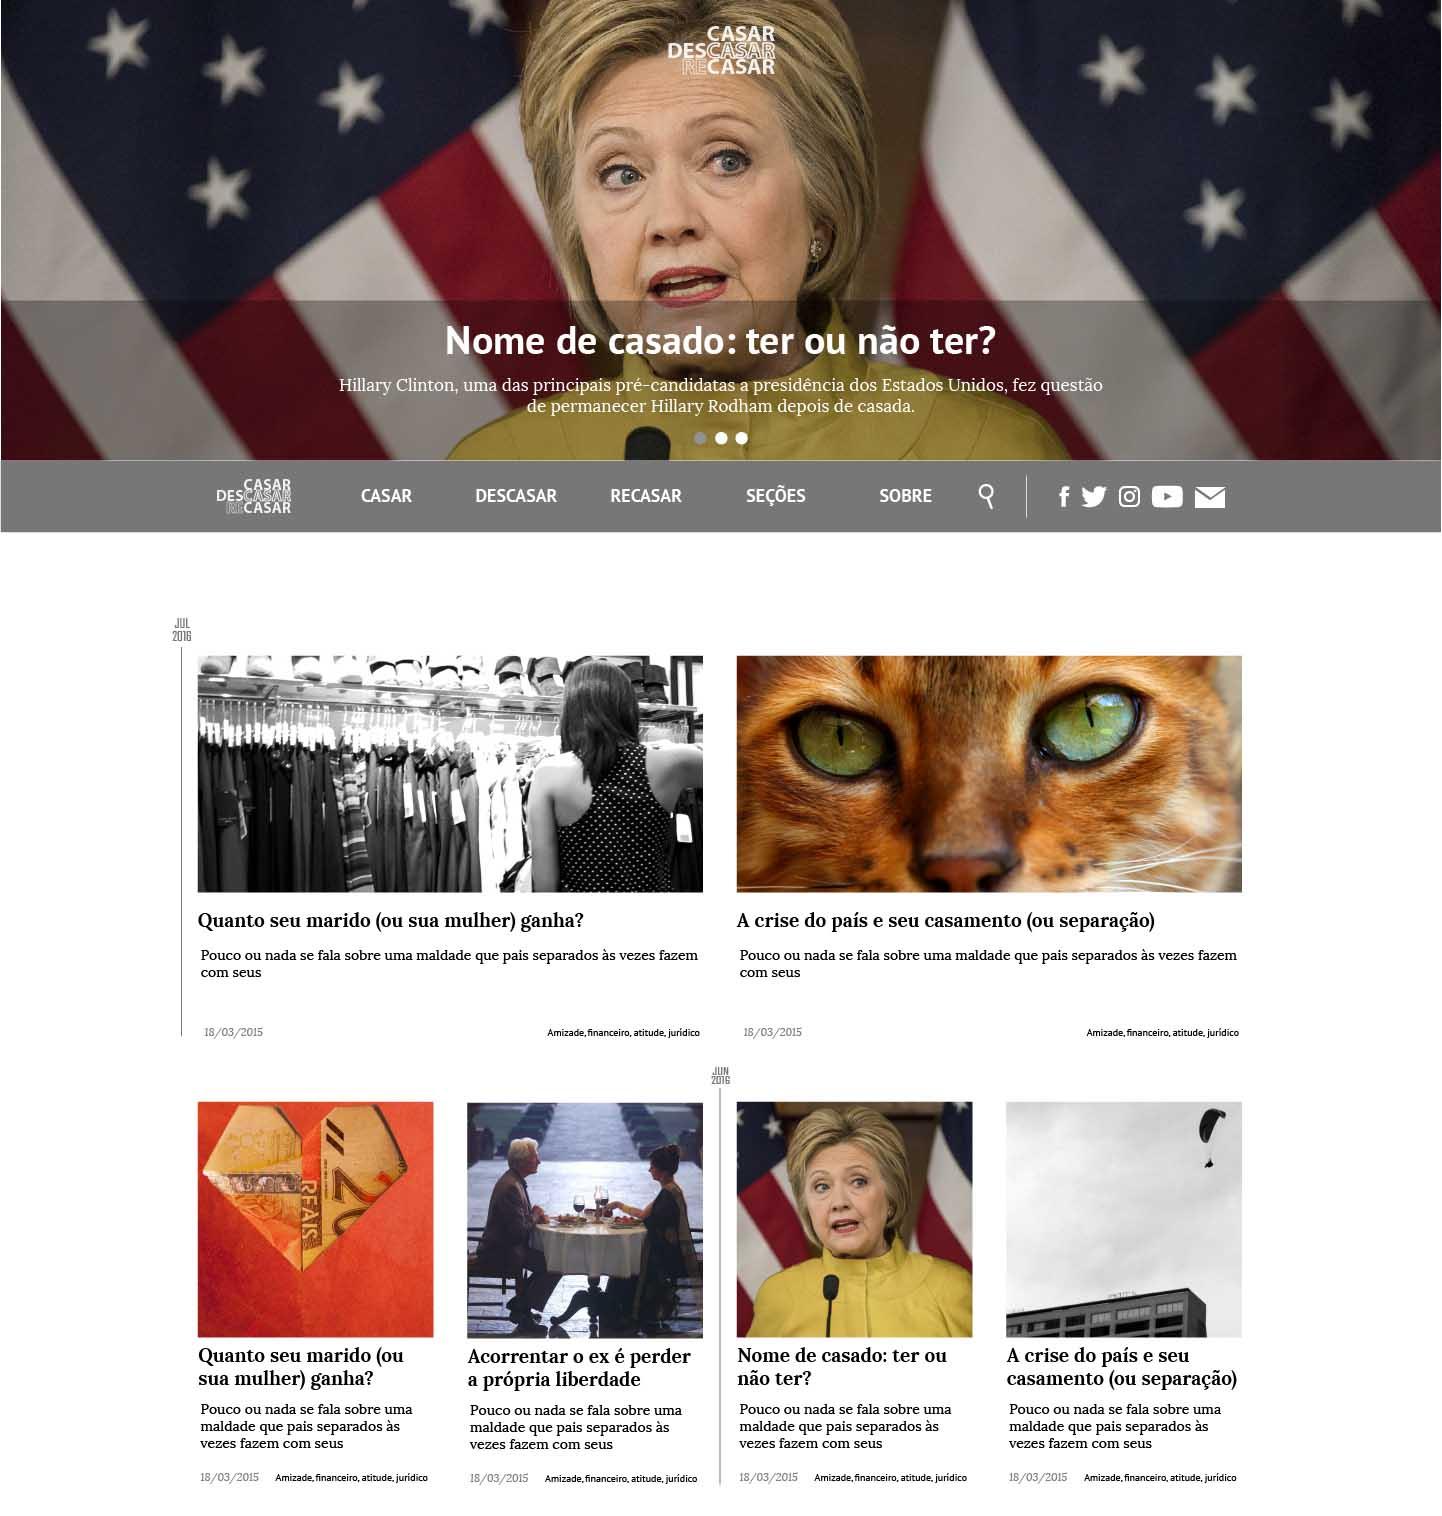 Homepage layout.